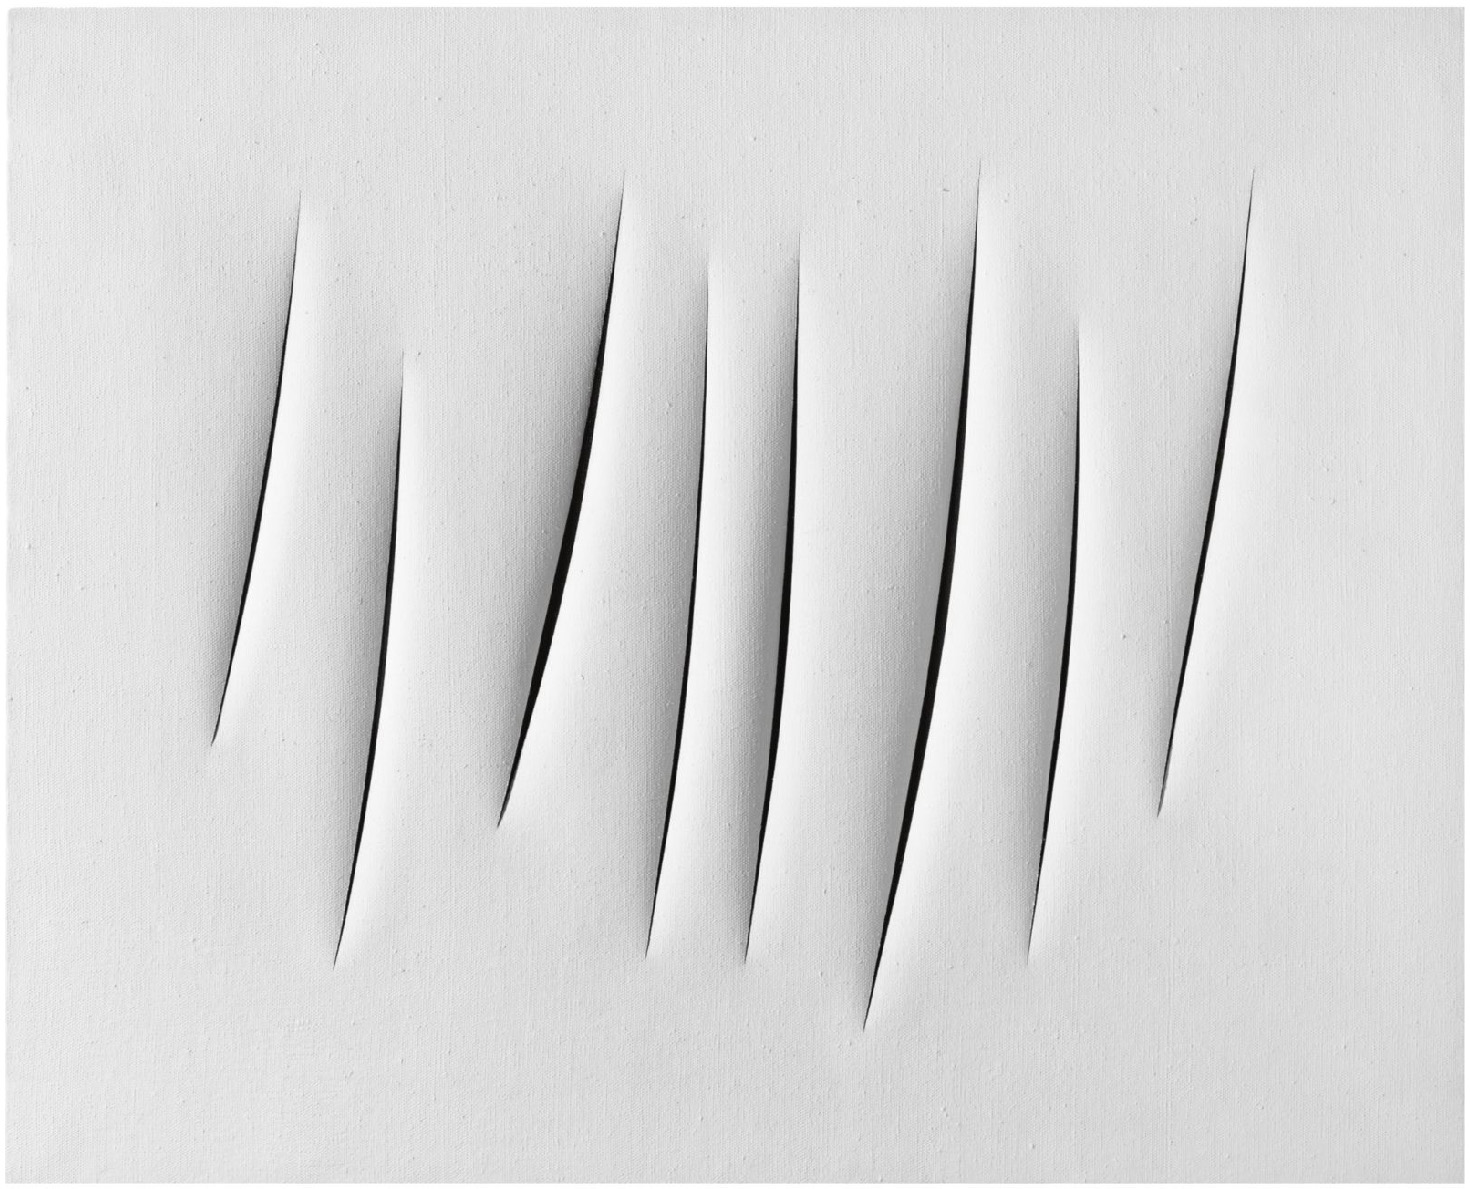 Lucio Fontana, Jon Kabat-Zinn, meditation, mindfulness, méditation